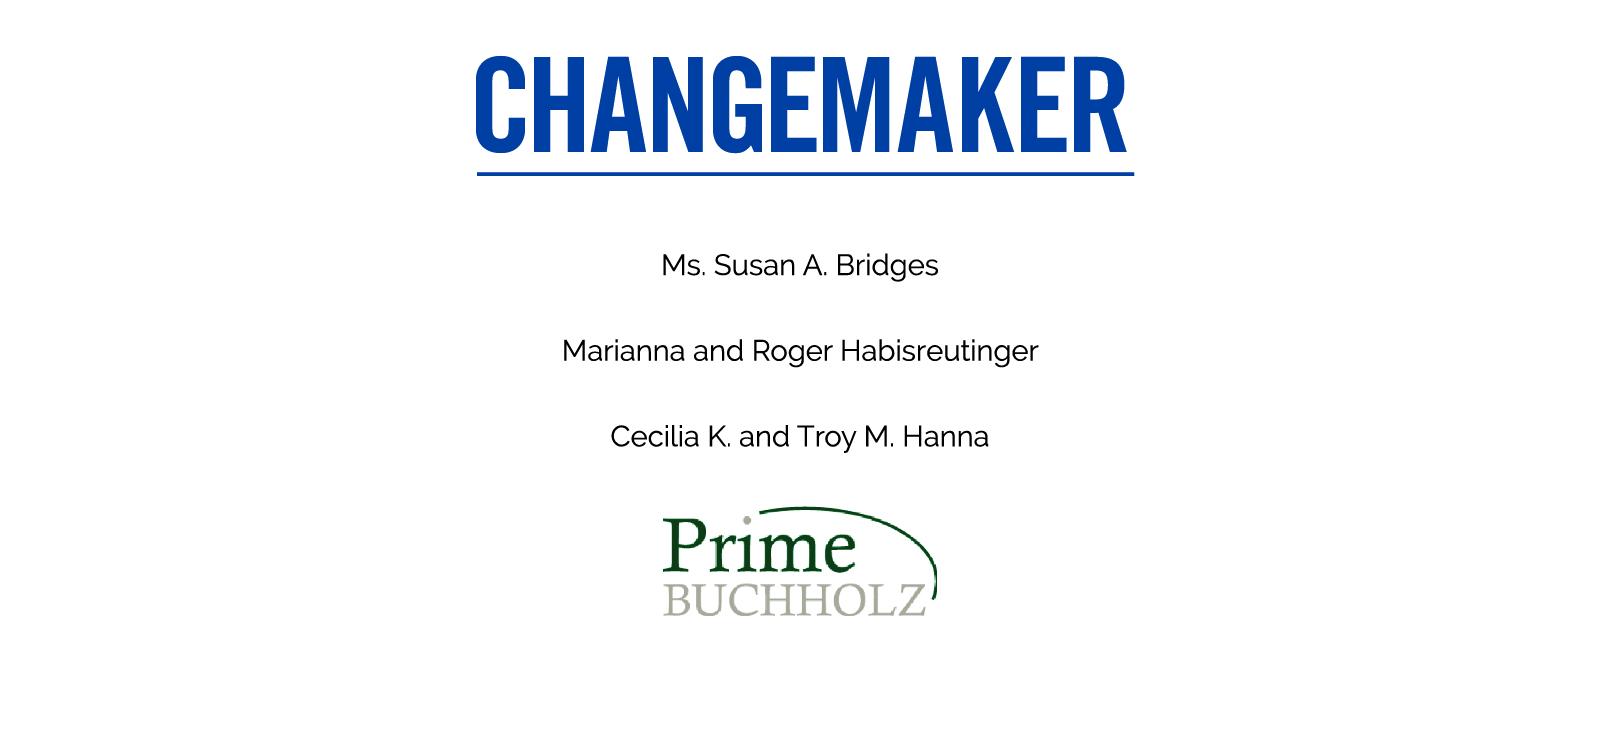 Changemaker Sponsorship